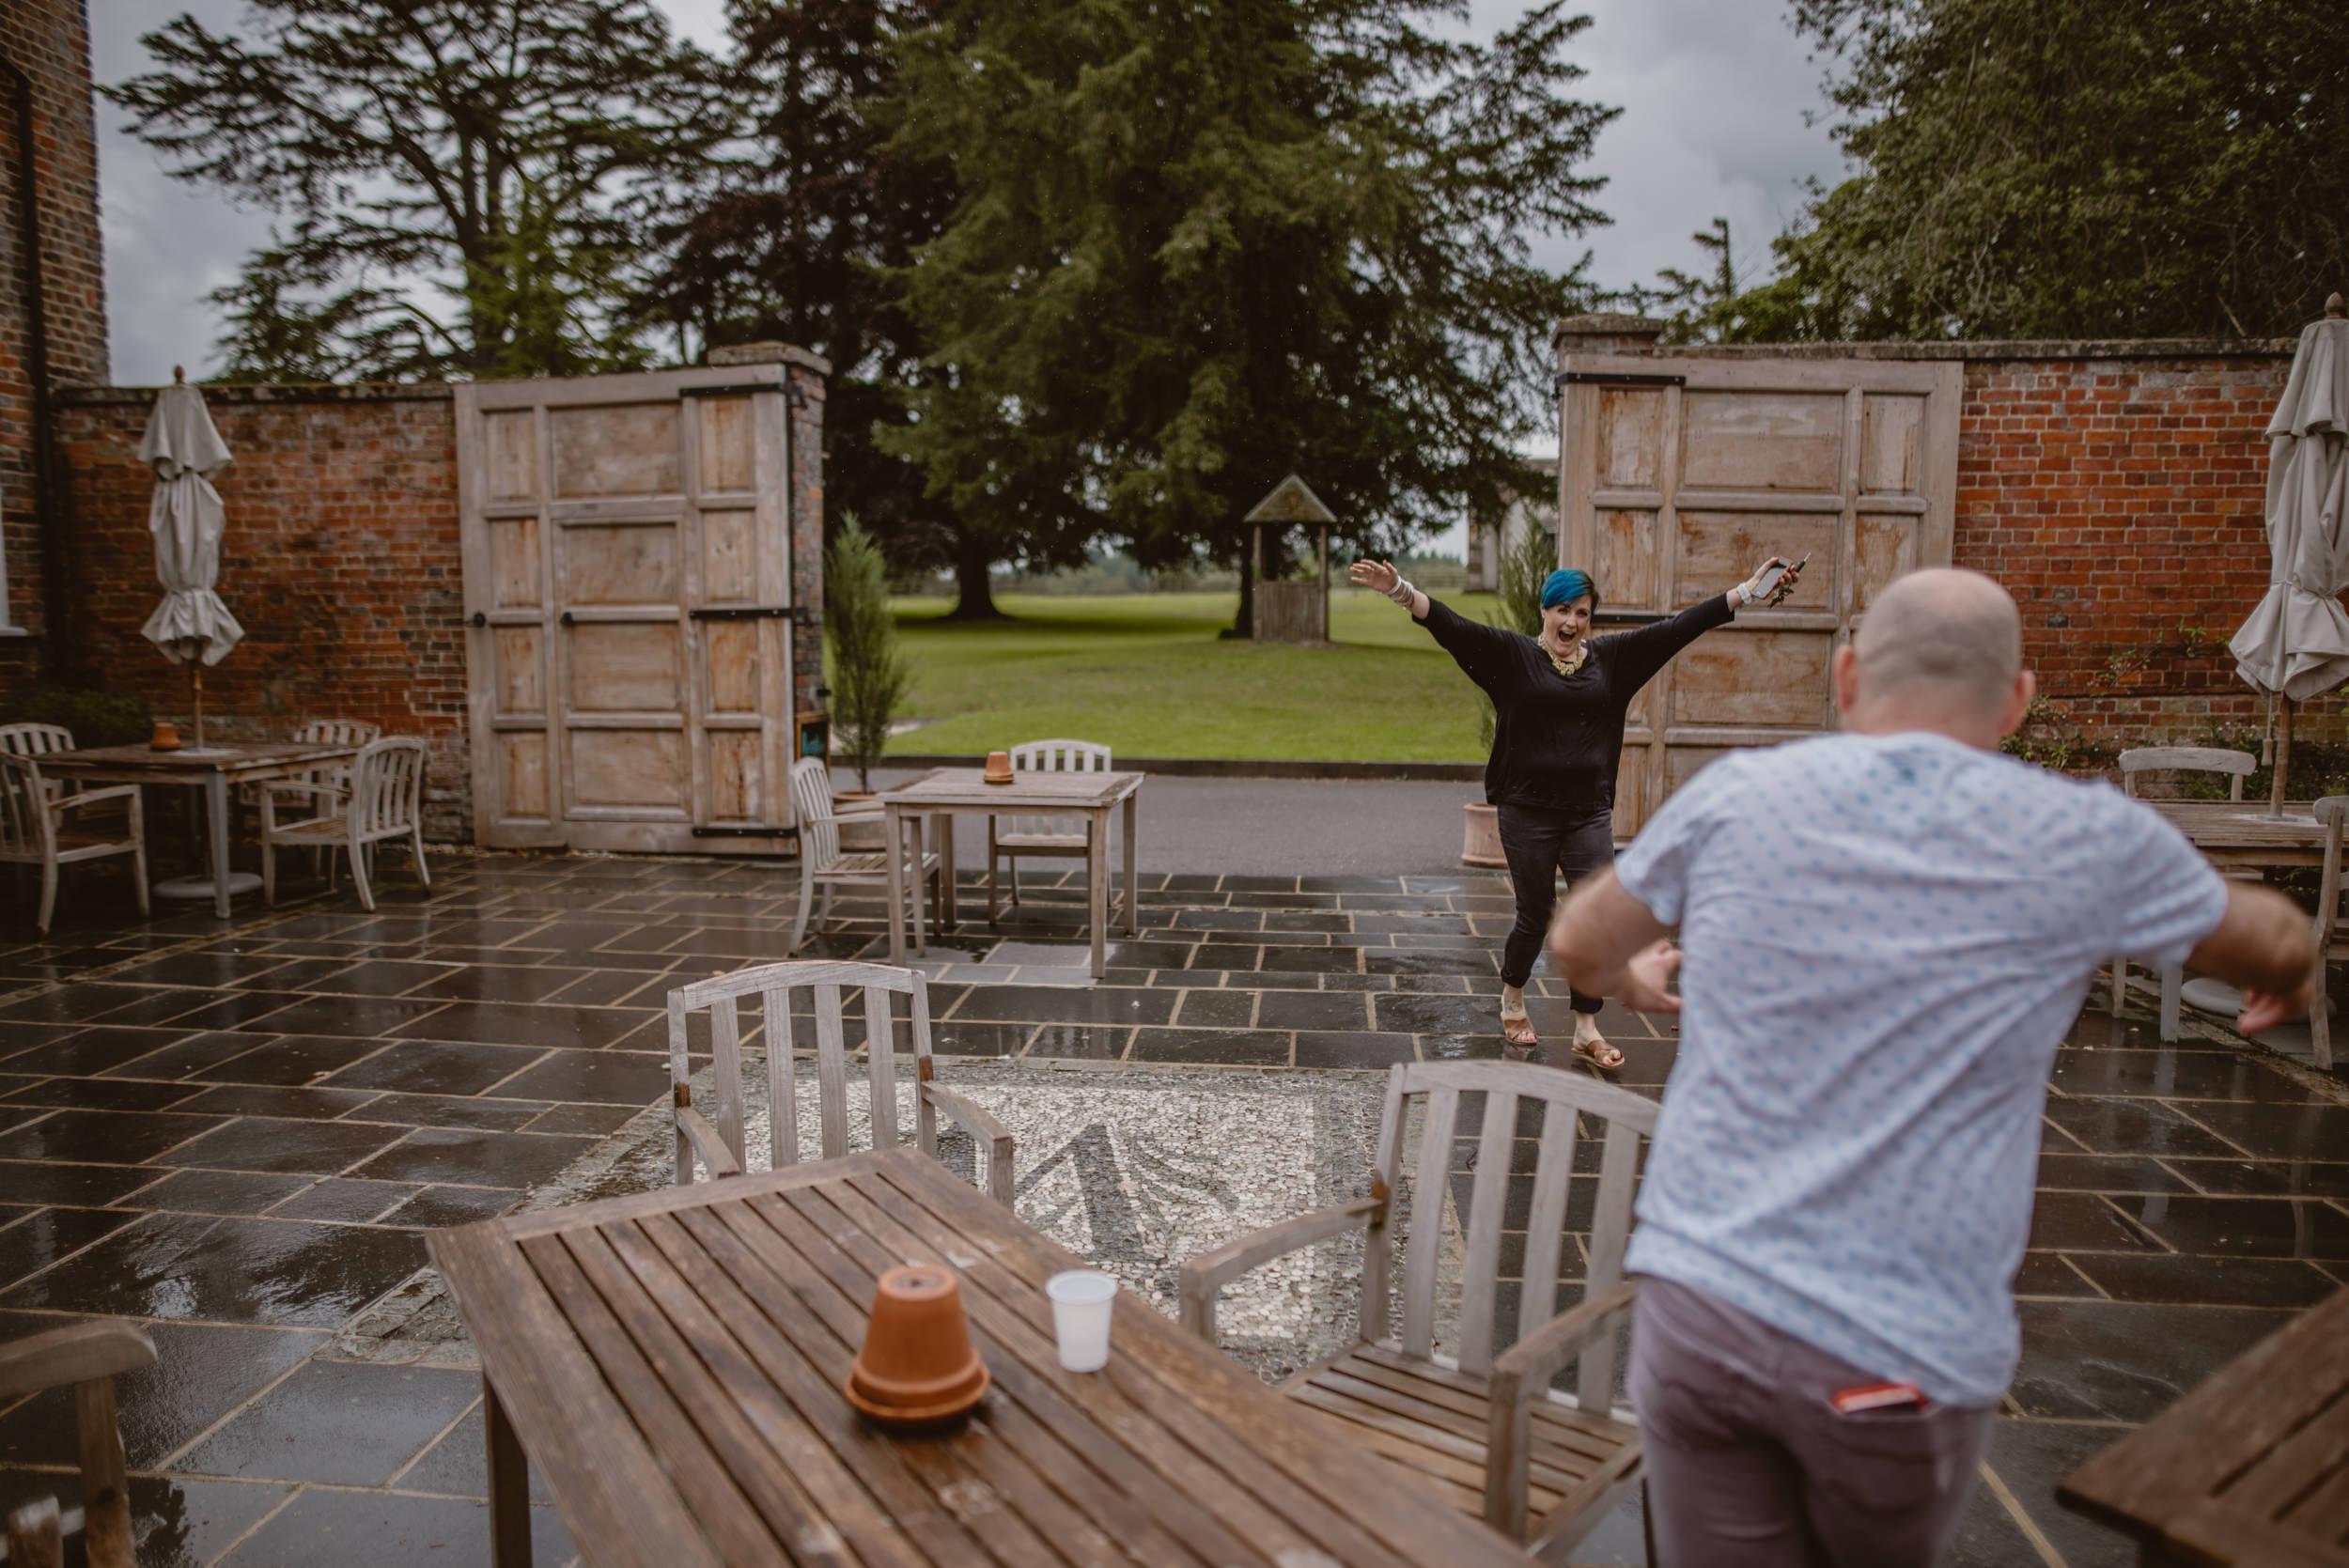 Barry-and-Chaz-wedding-Wasing-Park-Berkshire-Manu-Mendoza-Wedding-Photography-075.jpg